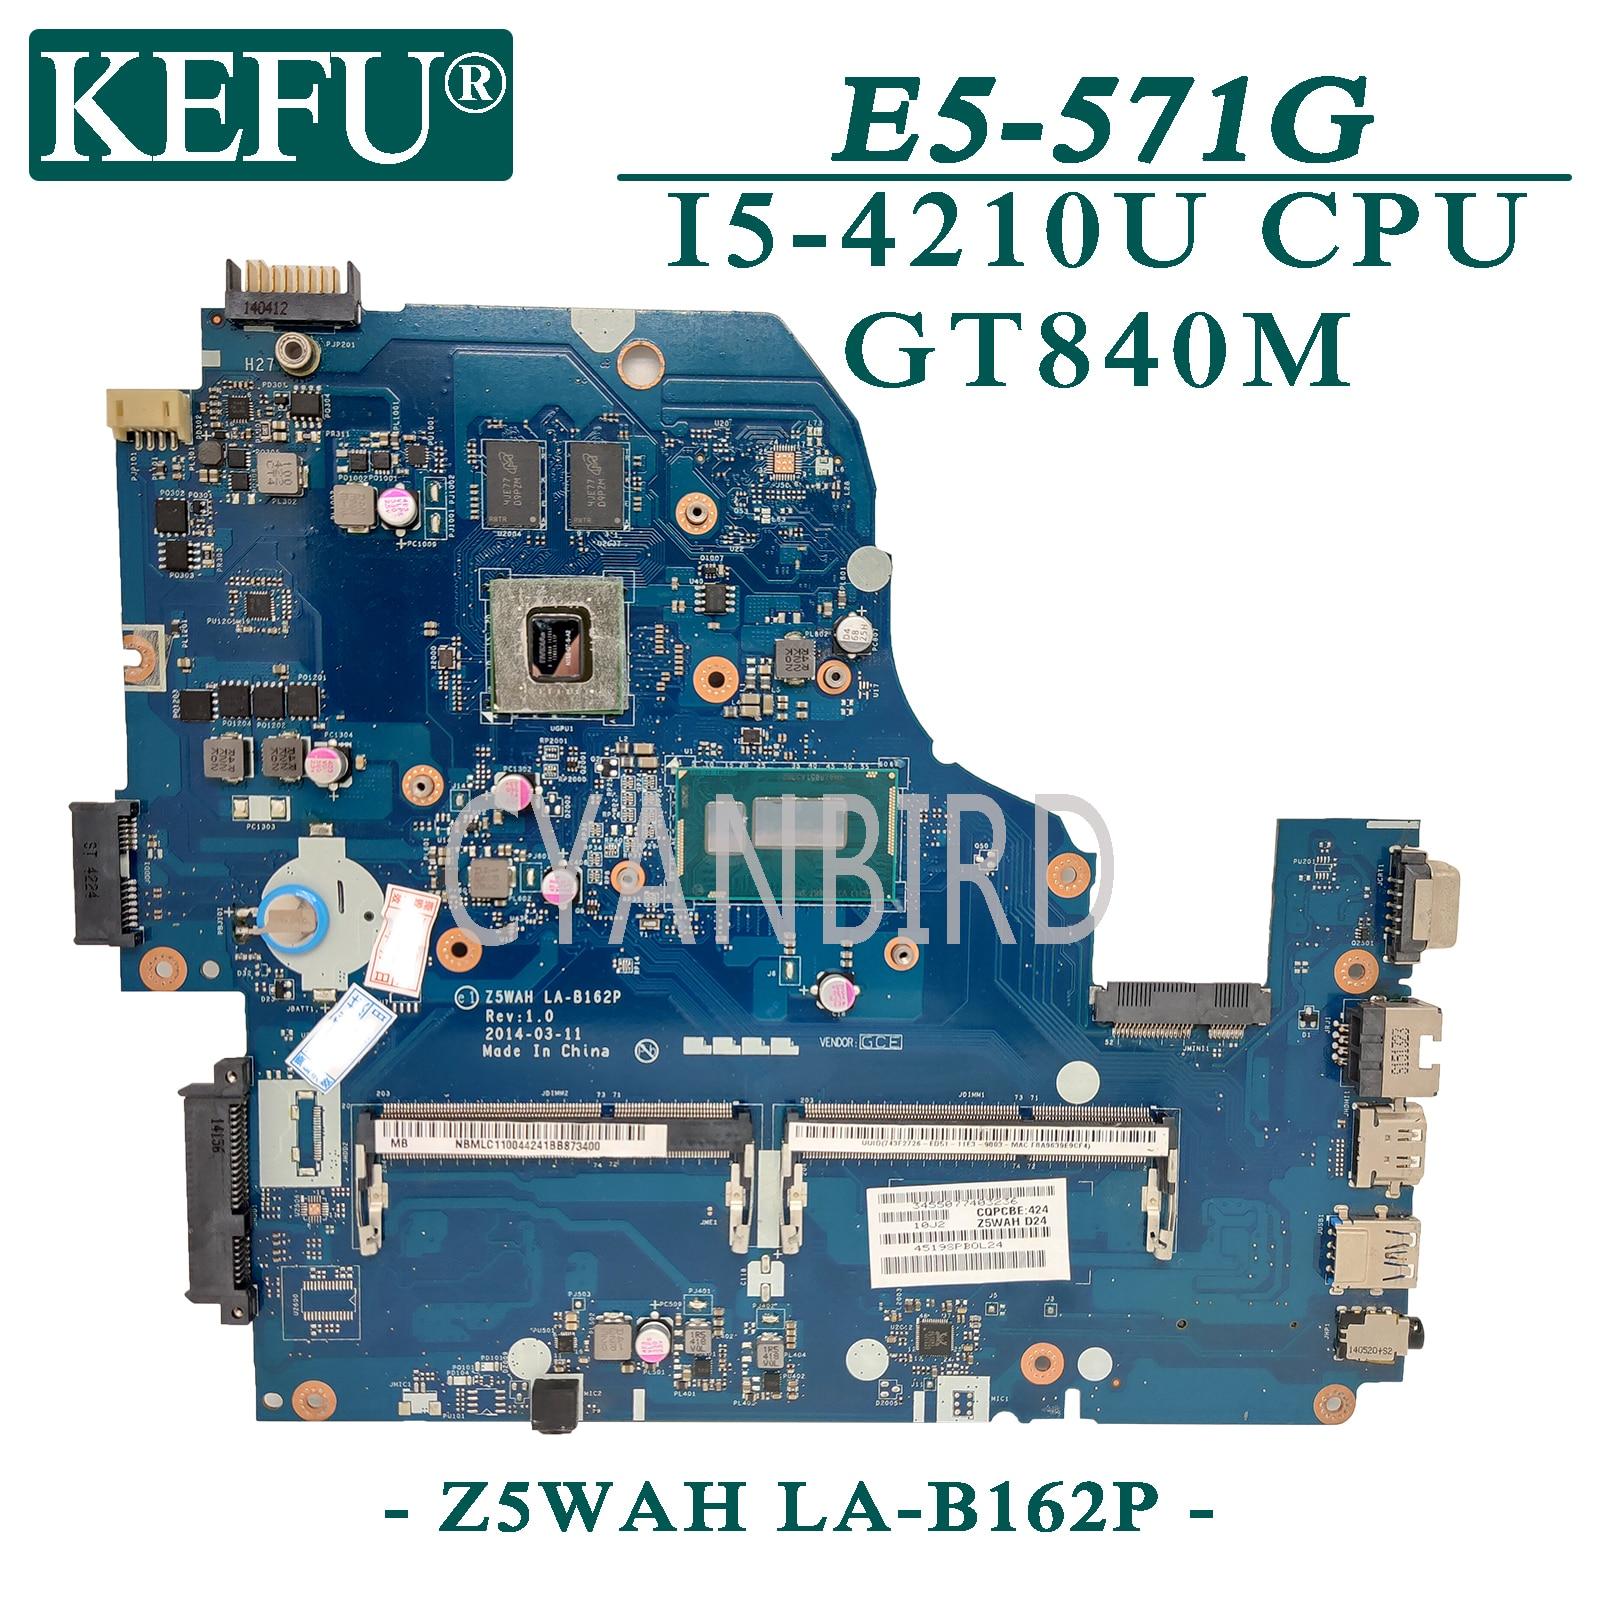 KEFU Z5WAH LA-B162P اللوحة الرئيسية الأصلية لشركة أيسر E5-571G مع I5-4210U اللوحة الأم GT840M